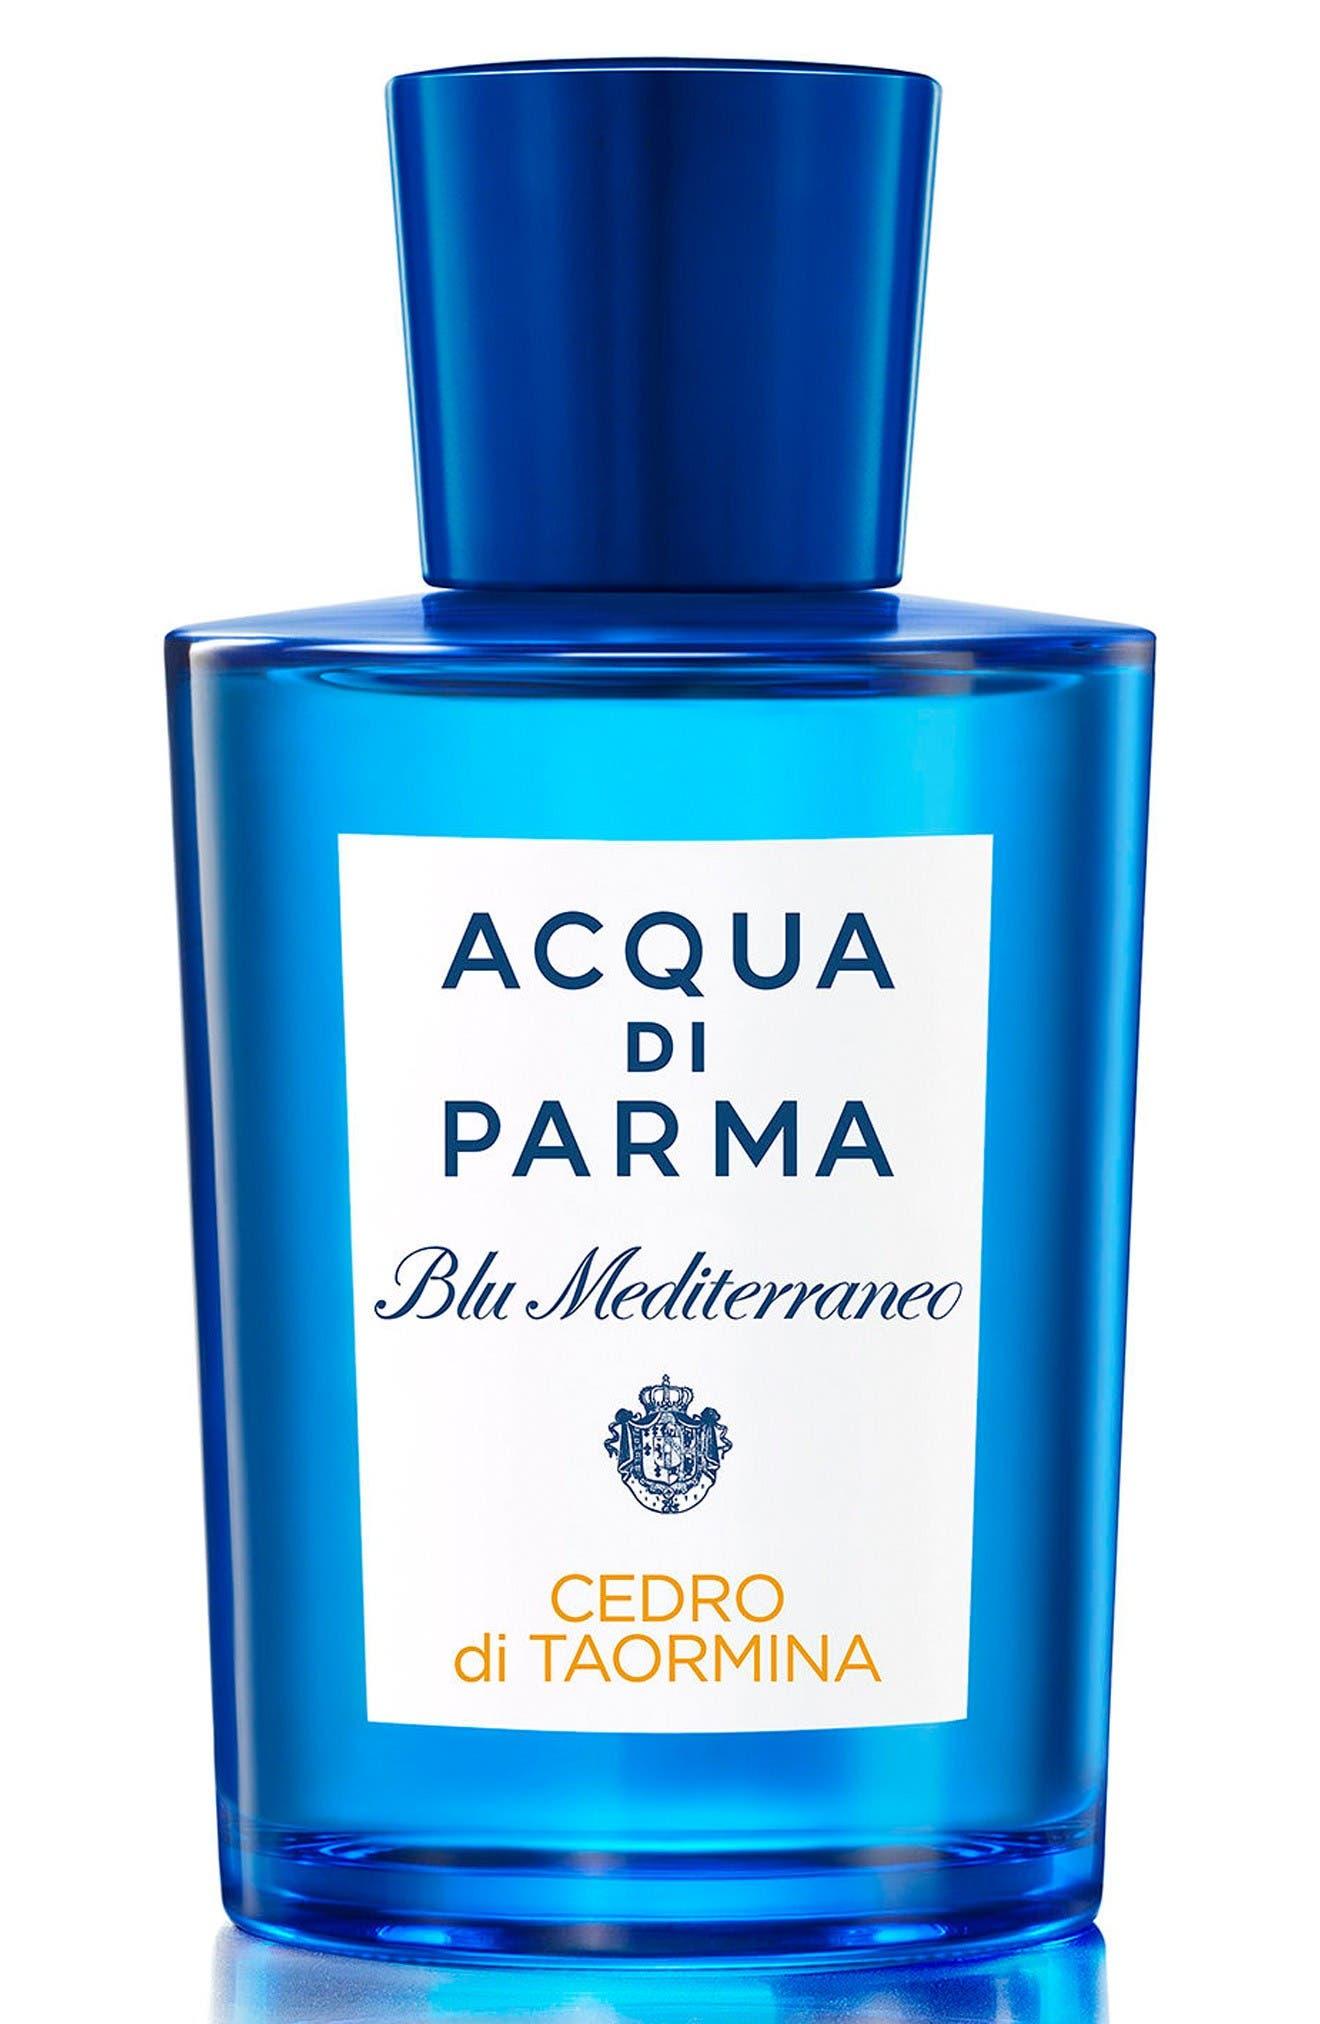 Acqua di Parma 'Blu Mediterraneo Cedro di Taormina' Eau de Toilette